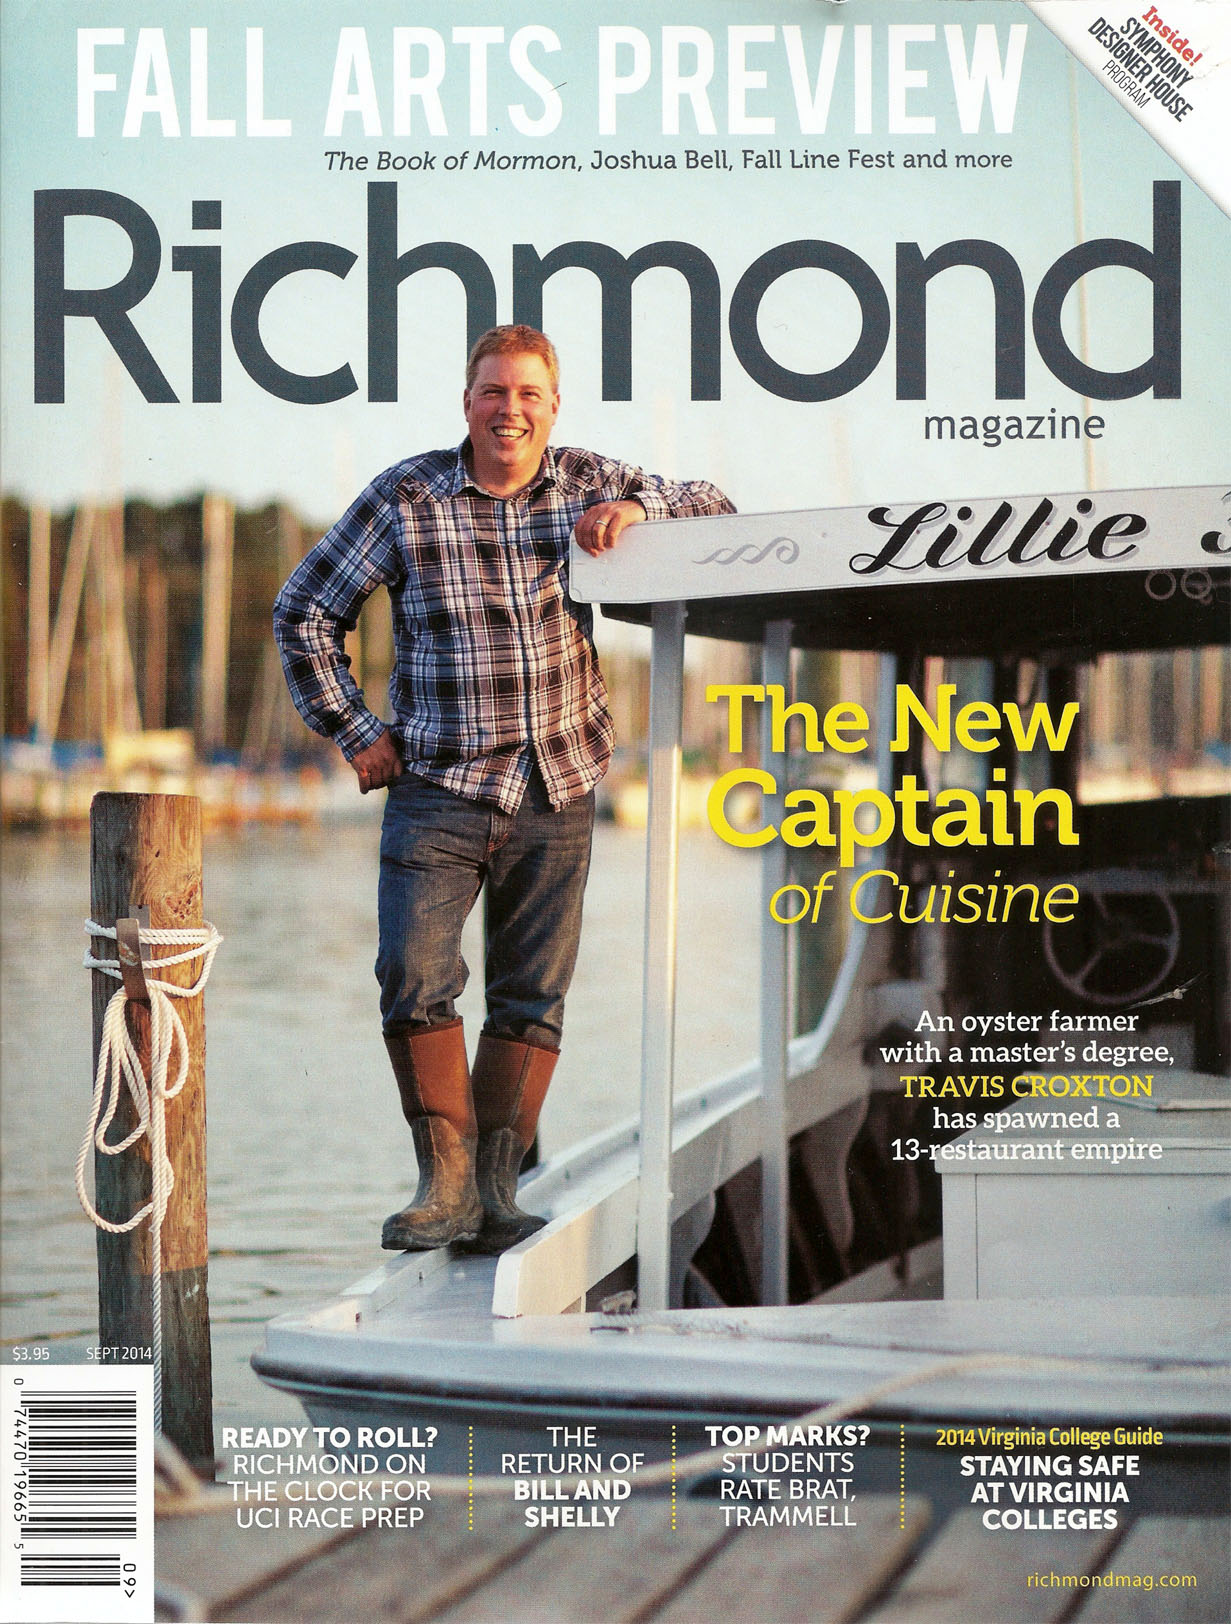 Richmond Magazine September 2014